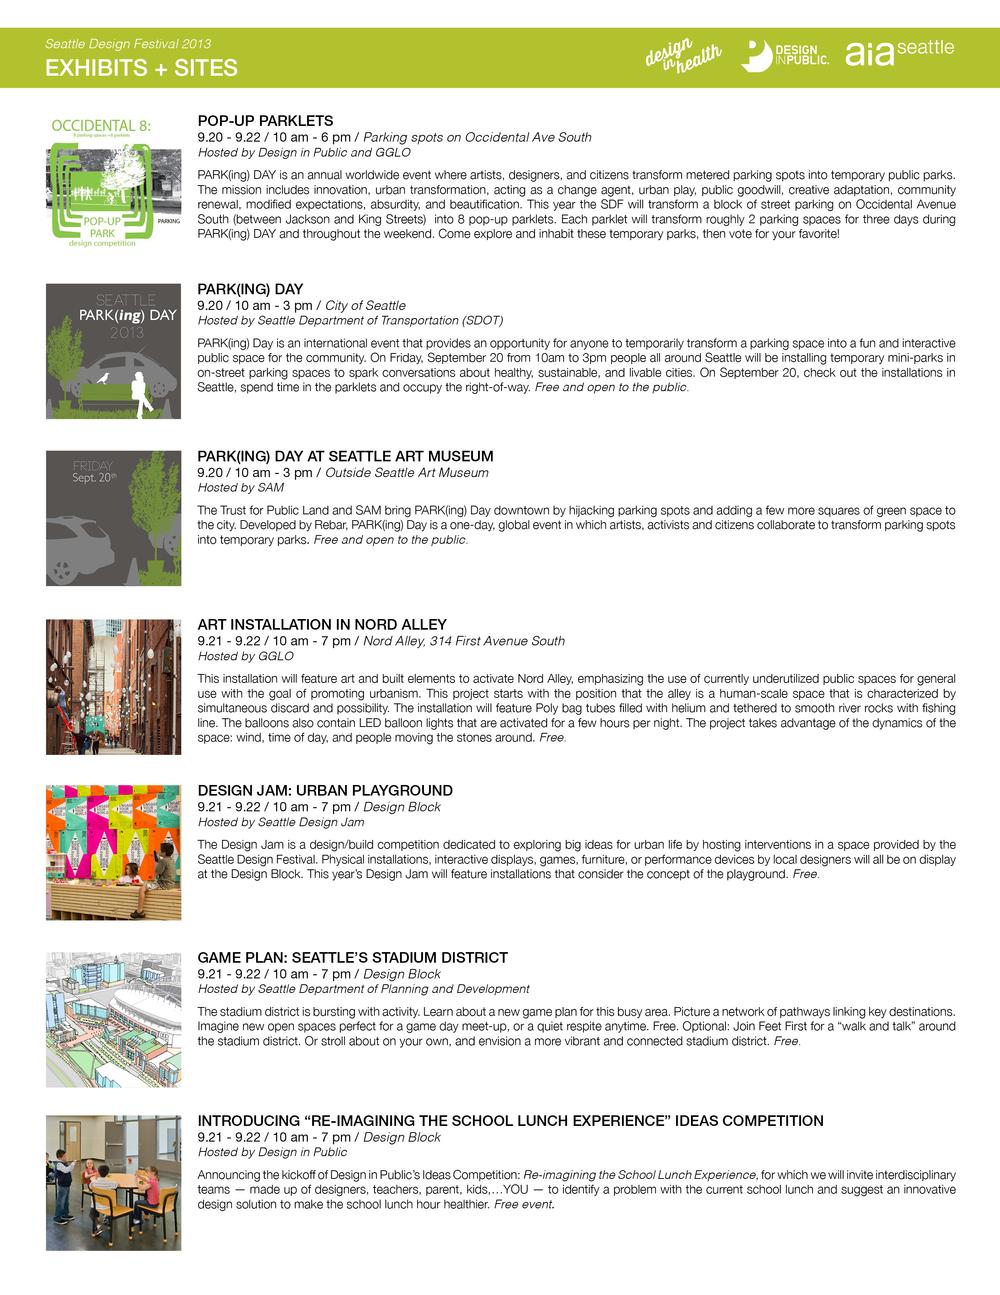 SDF13_festival program_of_events_web27.jpg